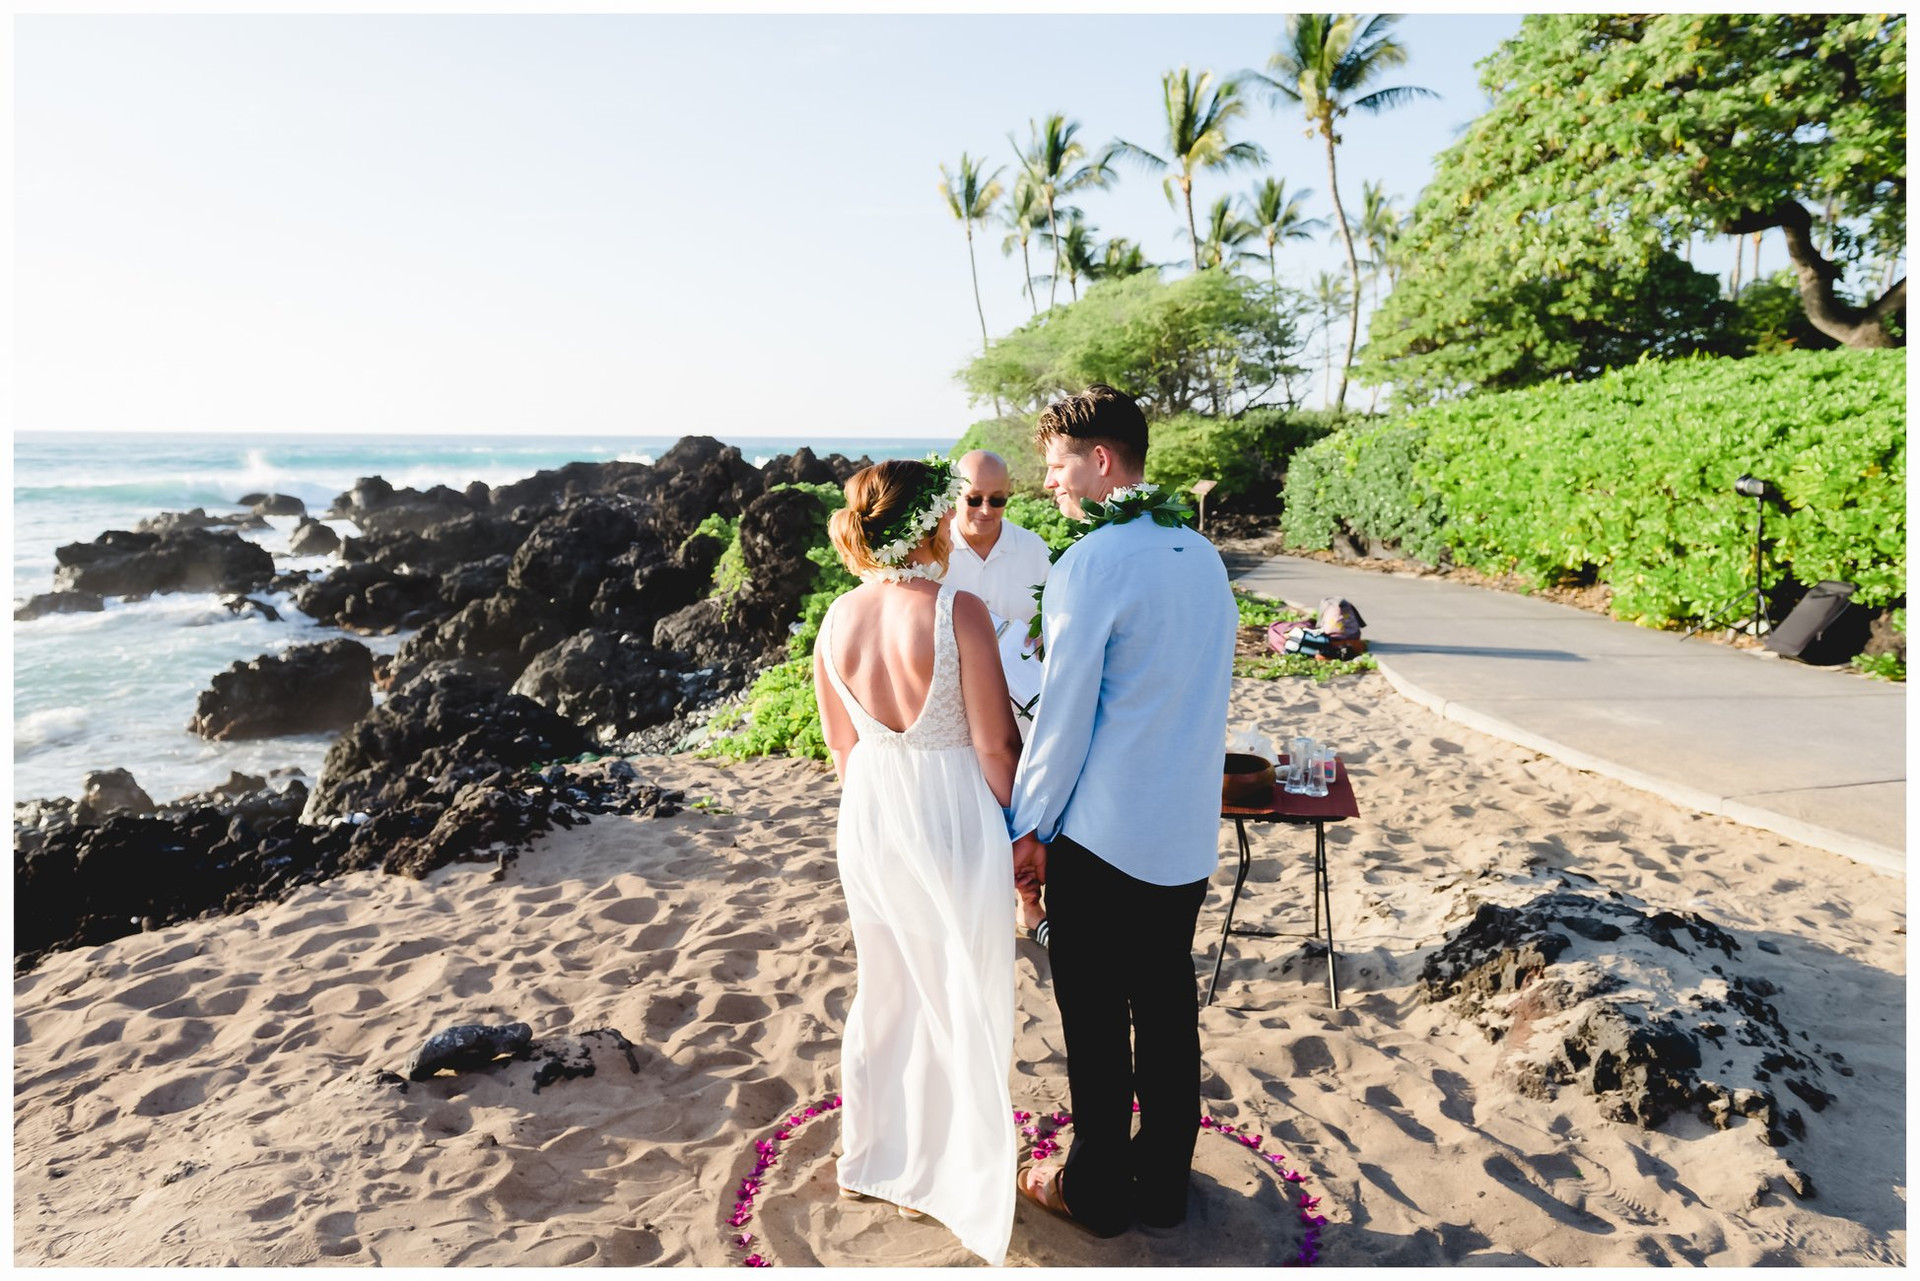 Hawaii Beach Weddings-15.jpg